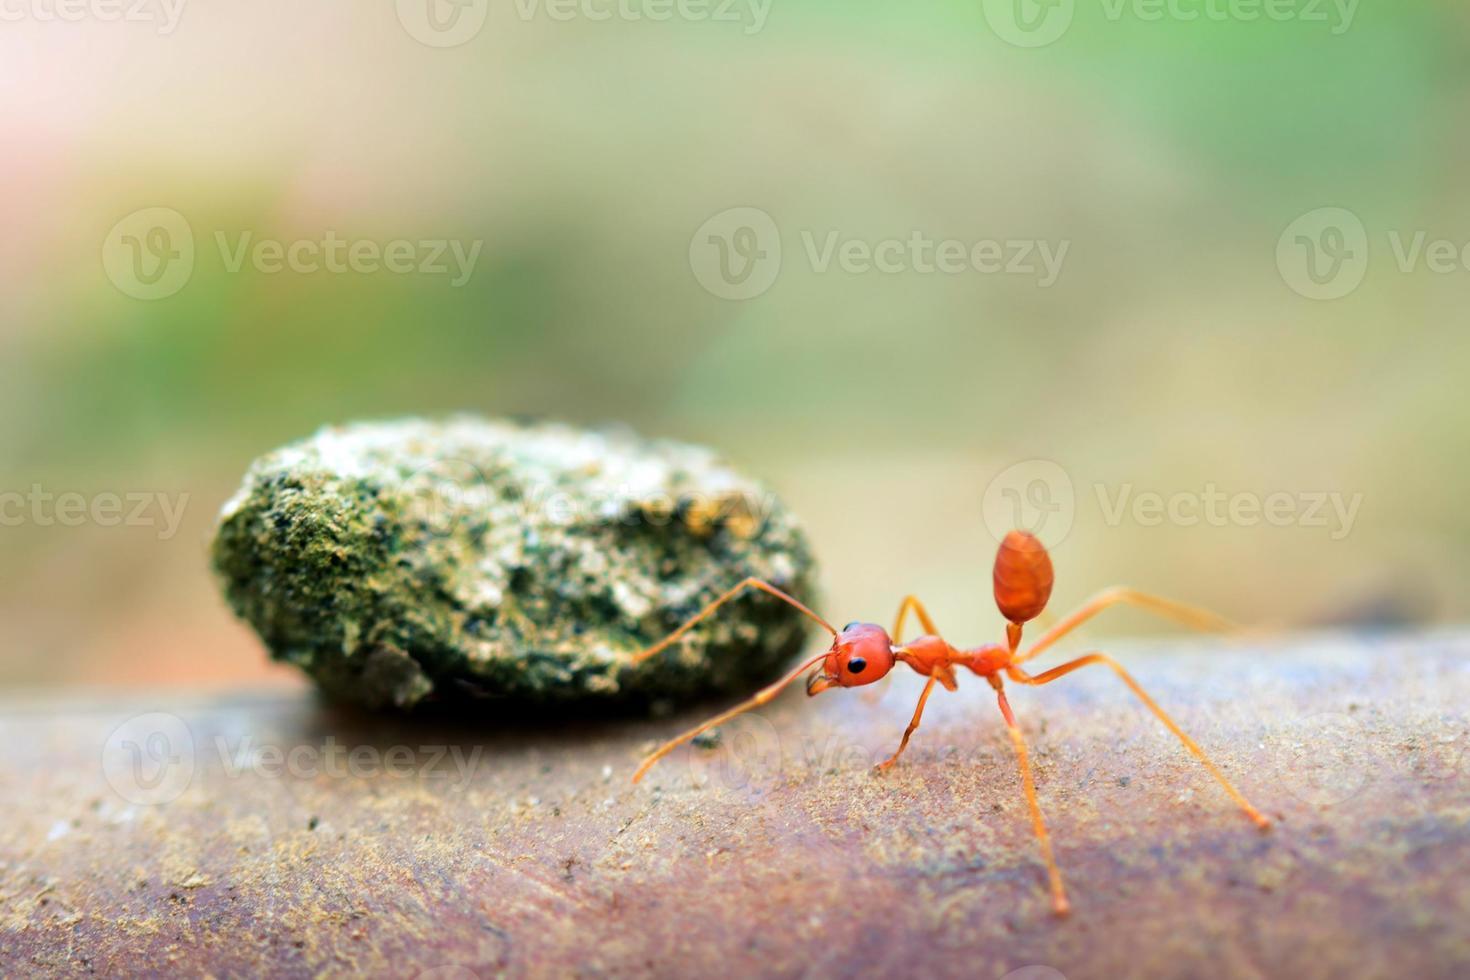 Ant tiny world (Macro, selective focus environment on leaf background) photo